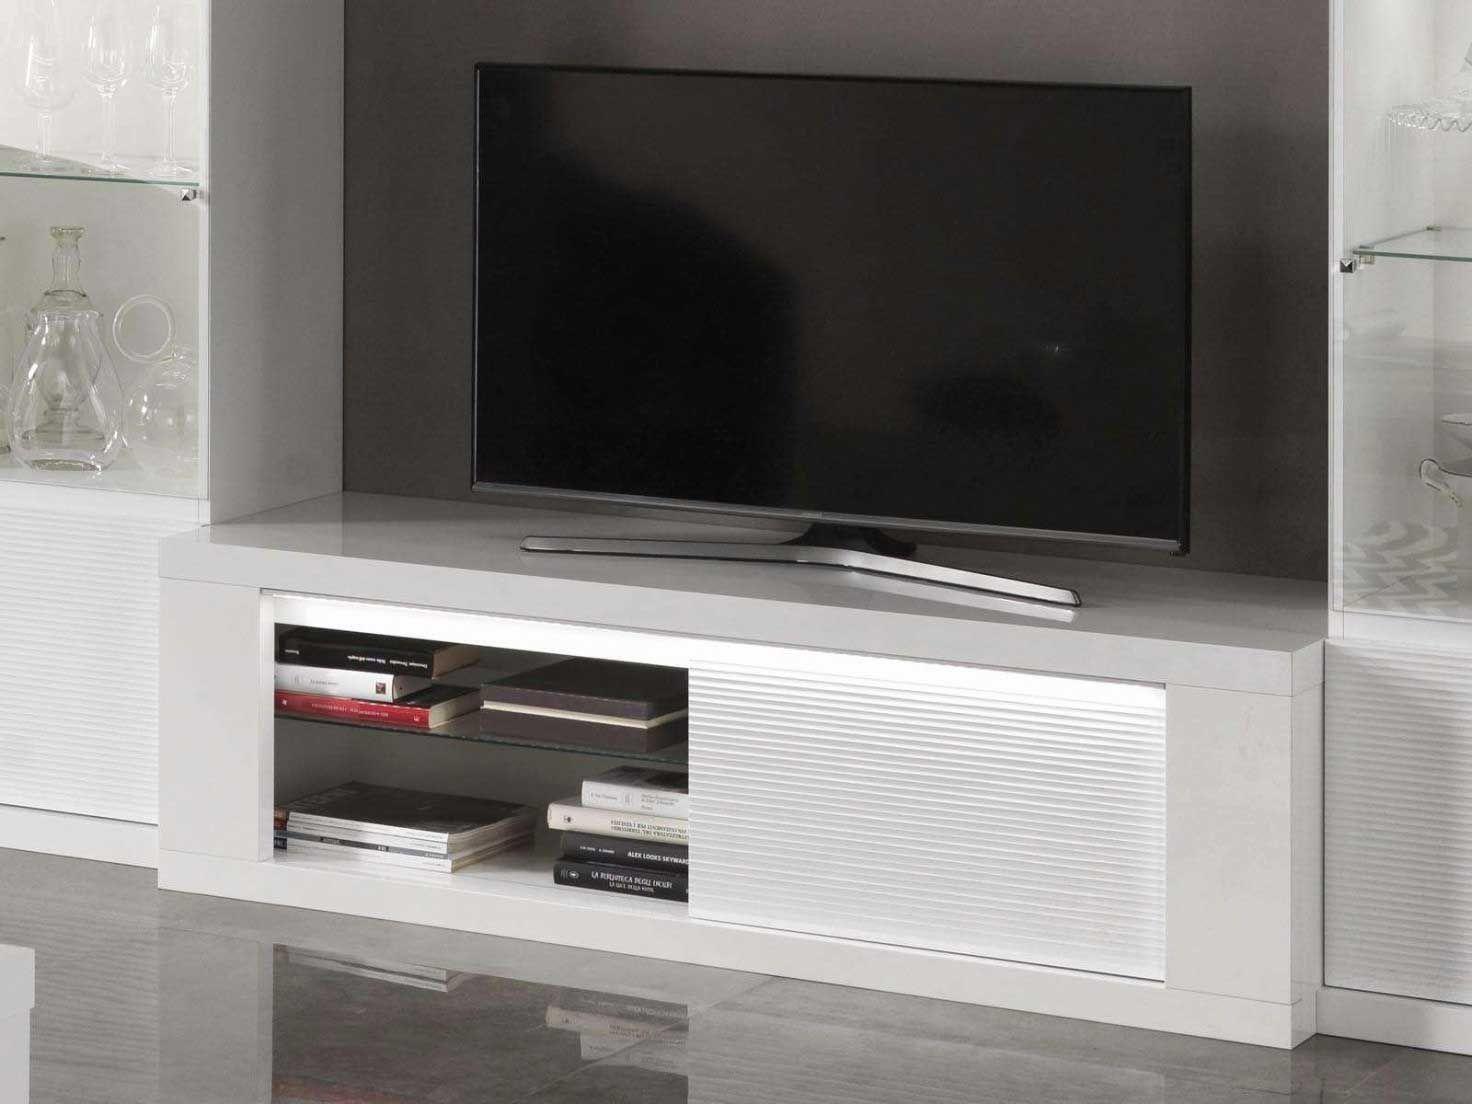 Meuble Tv Et Table Basse Bois Meuble Tv En Bois Meuble Tv Table Basse Luxe Banc Tv Bois Massif Of Me En 2020